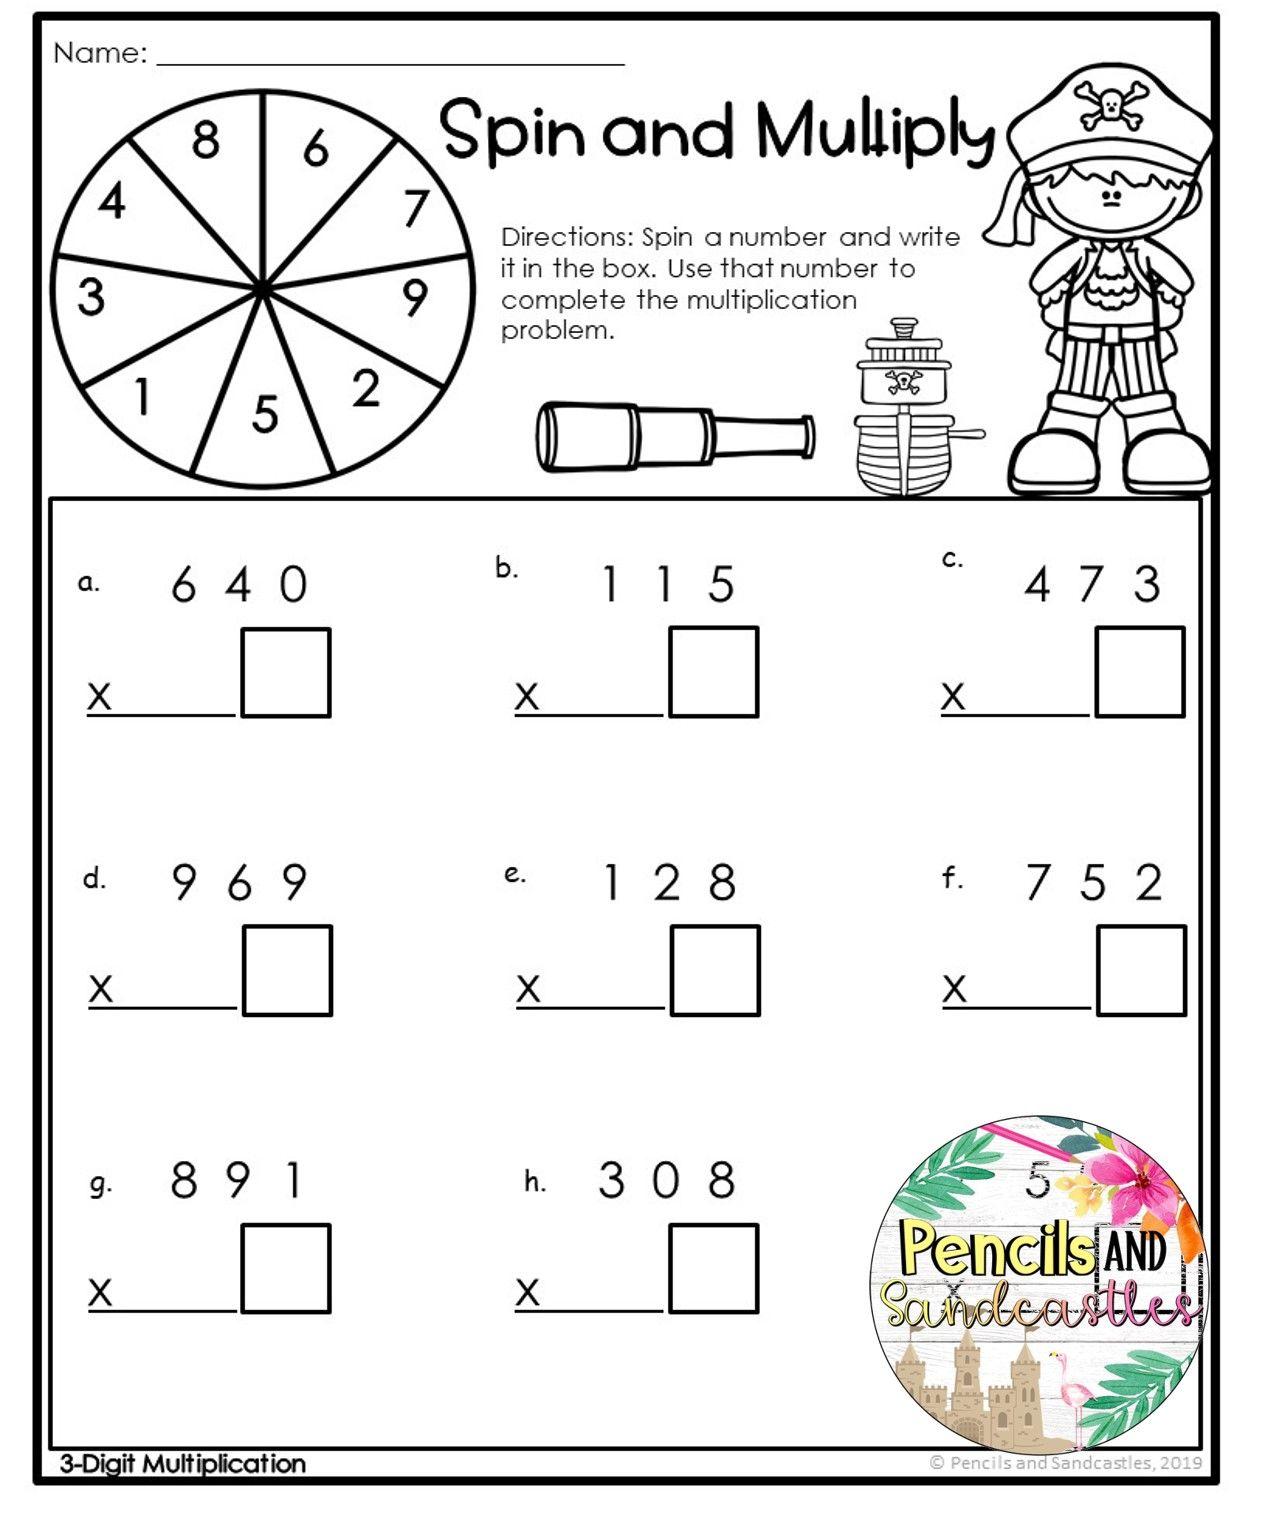 Multiplication Worksheets Print And Go 3digts By 1 Digit Multiplication Worksheets Multiplication Worksheets